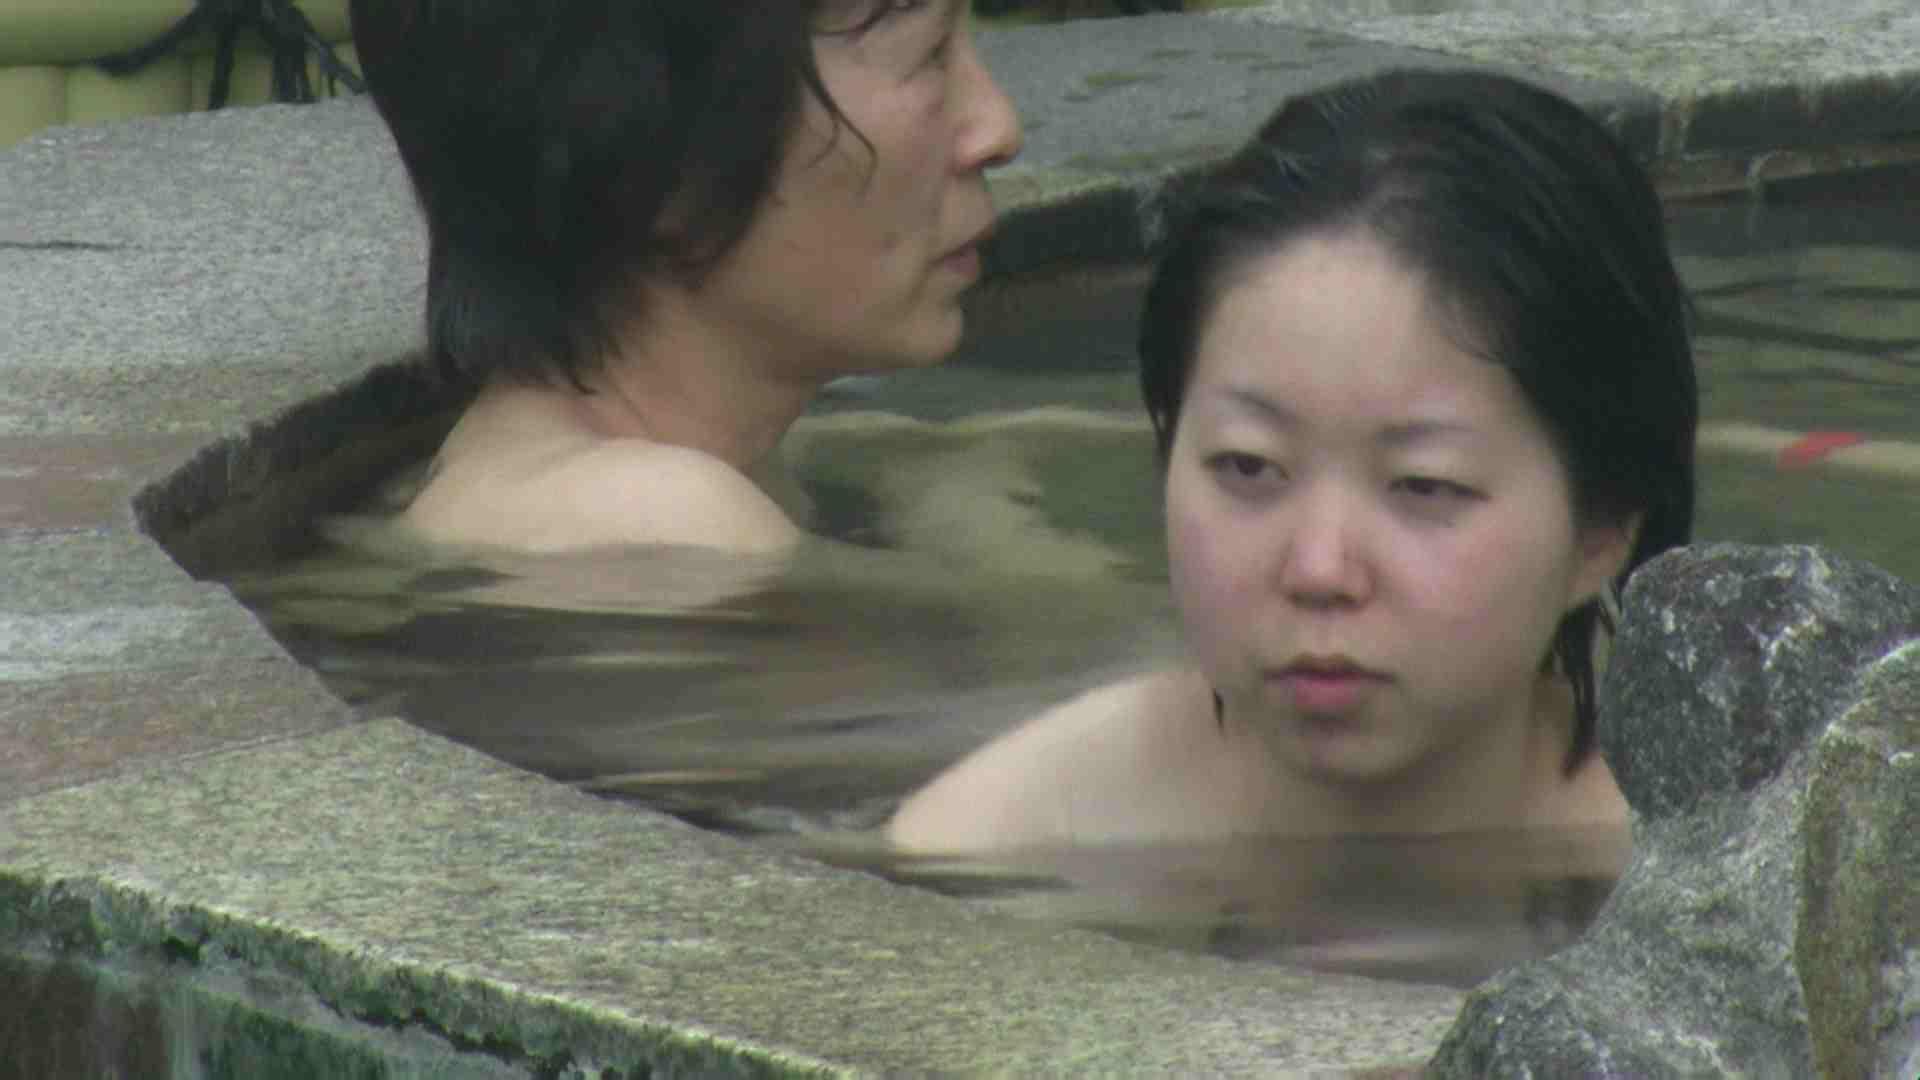 Aquaな露天風呂Vol.06【VIP】 HなOL | 盗撮  86pic 24